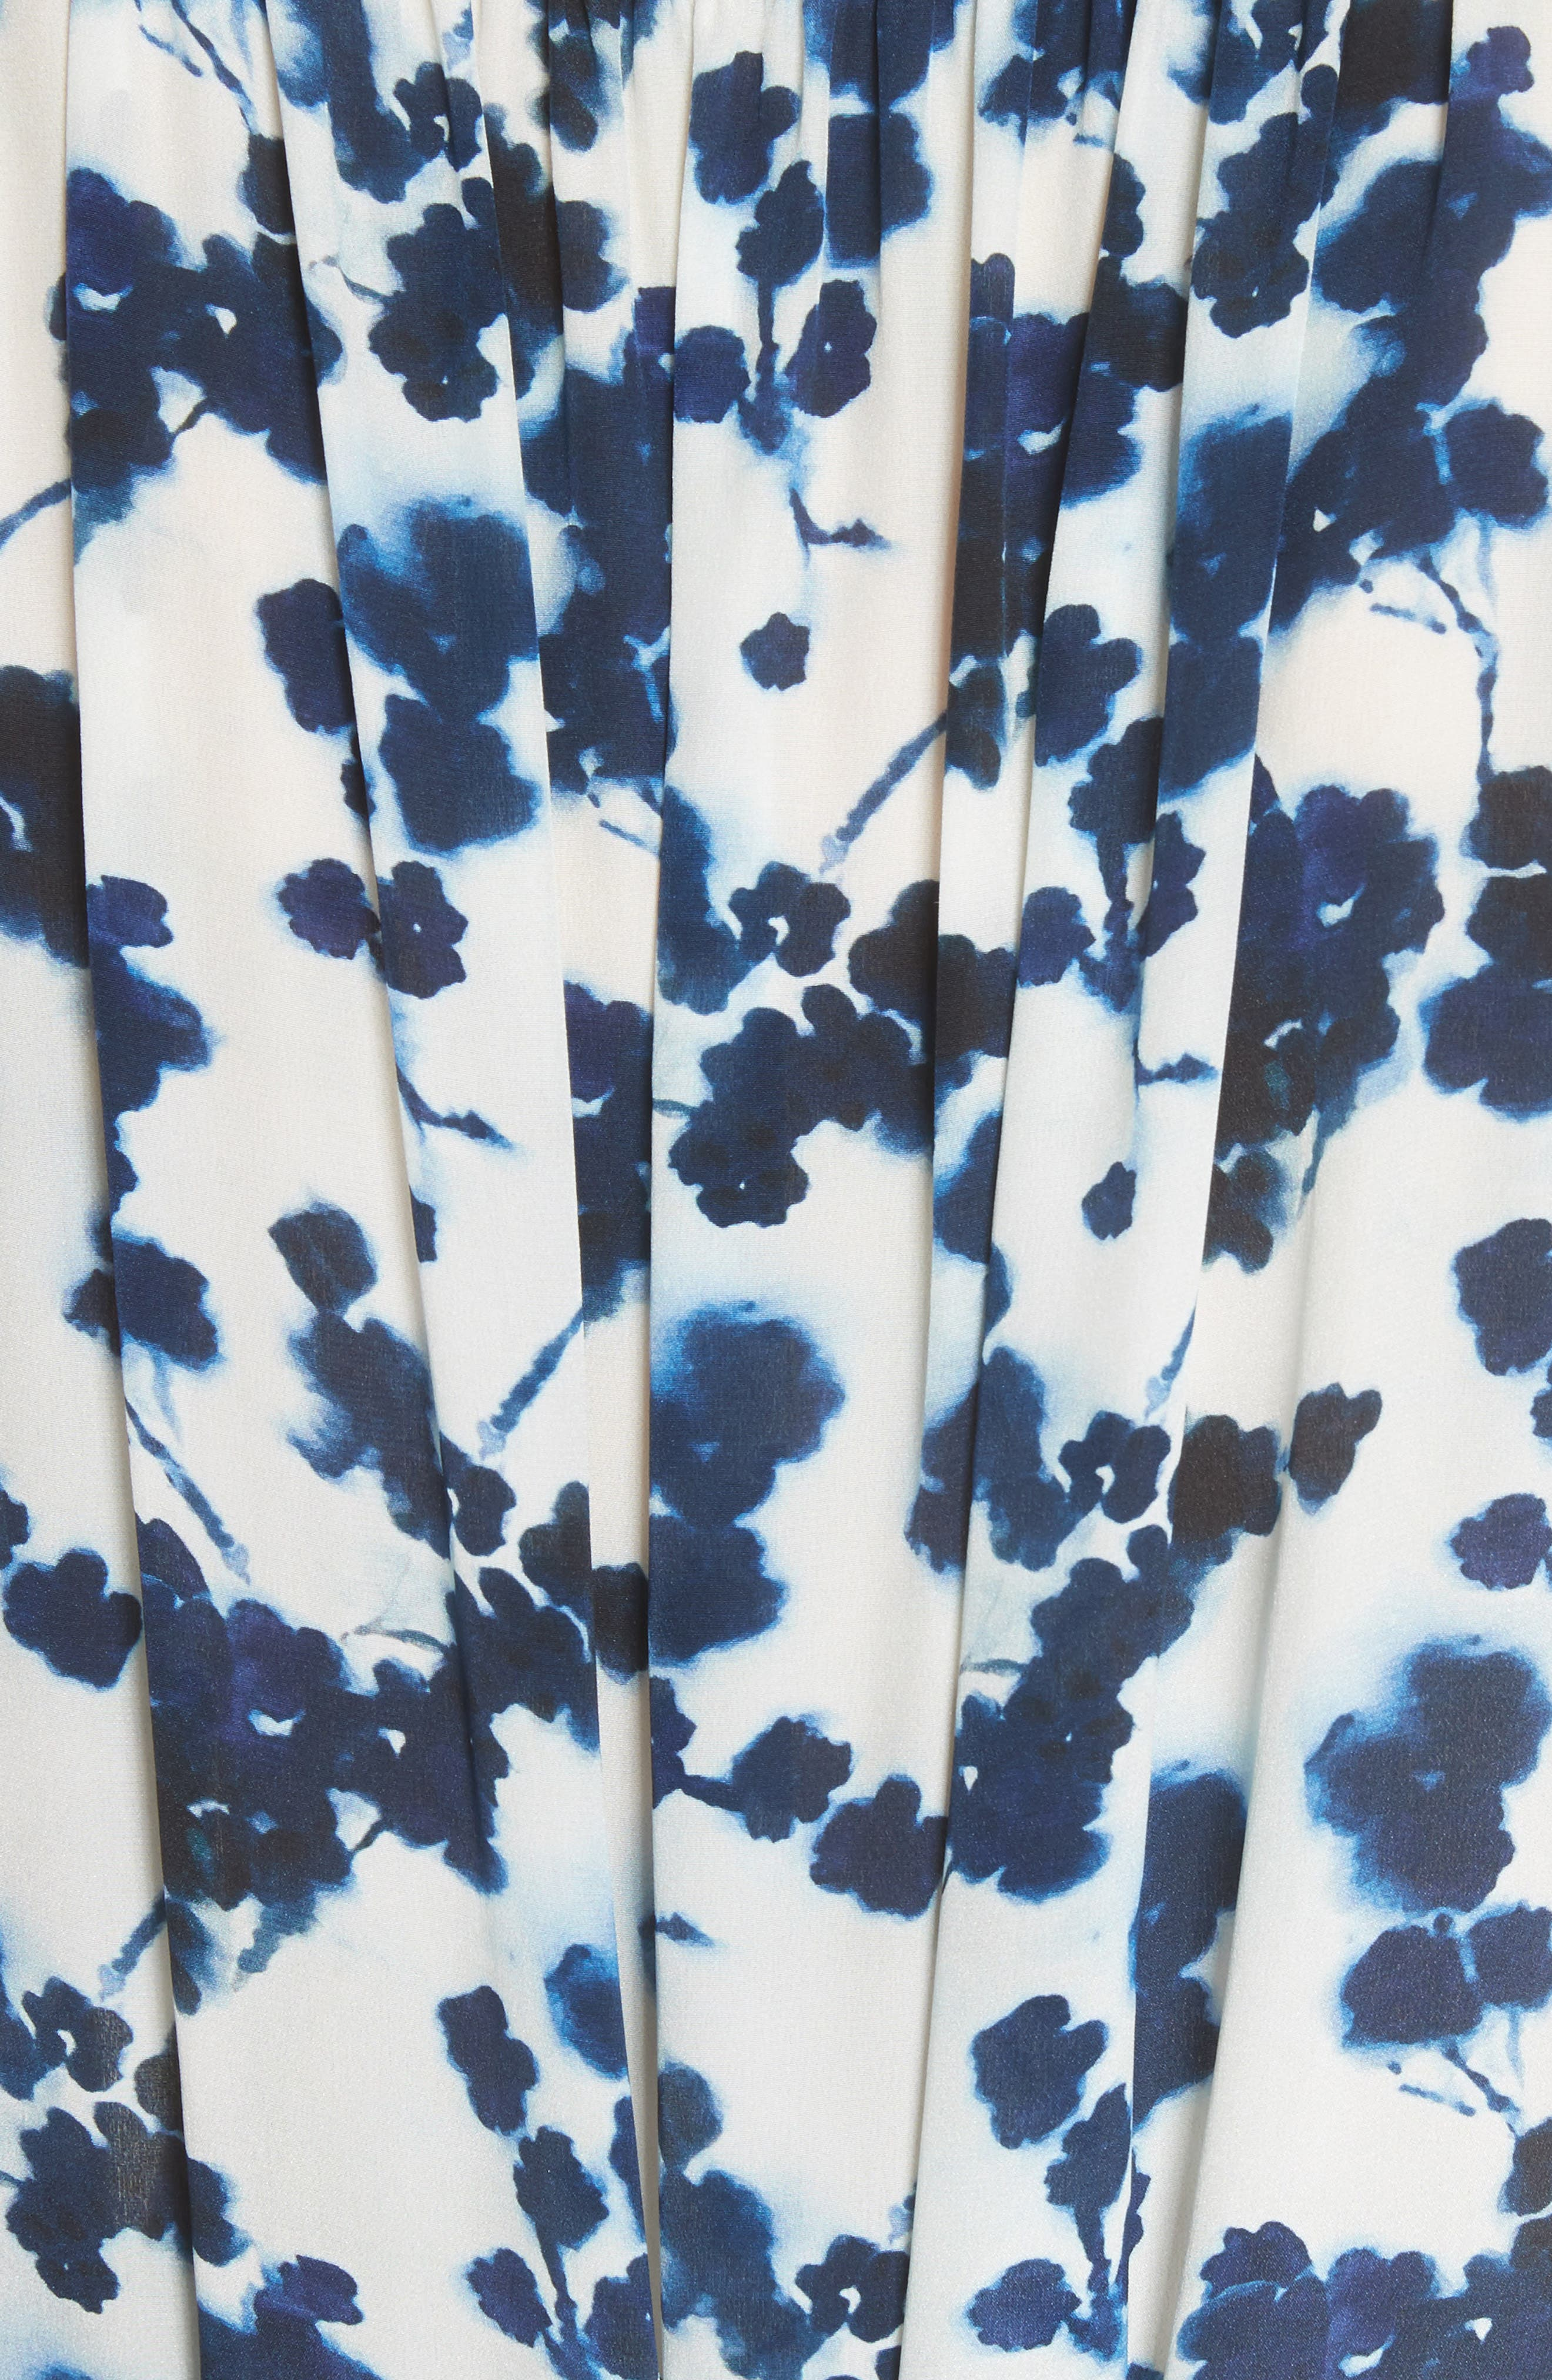 Lani P Floral Print Silk Dress,                             Alternate thumbnail 5, color,                             426